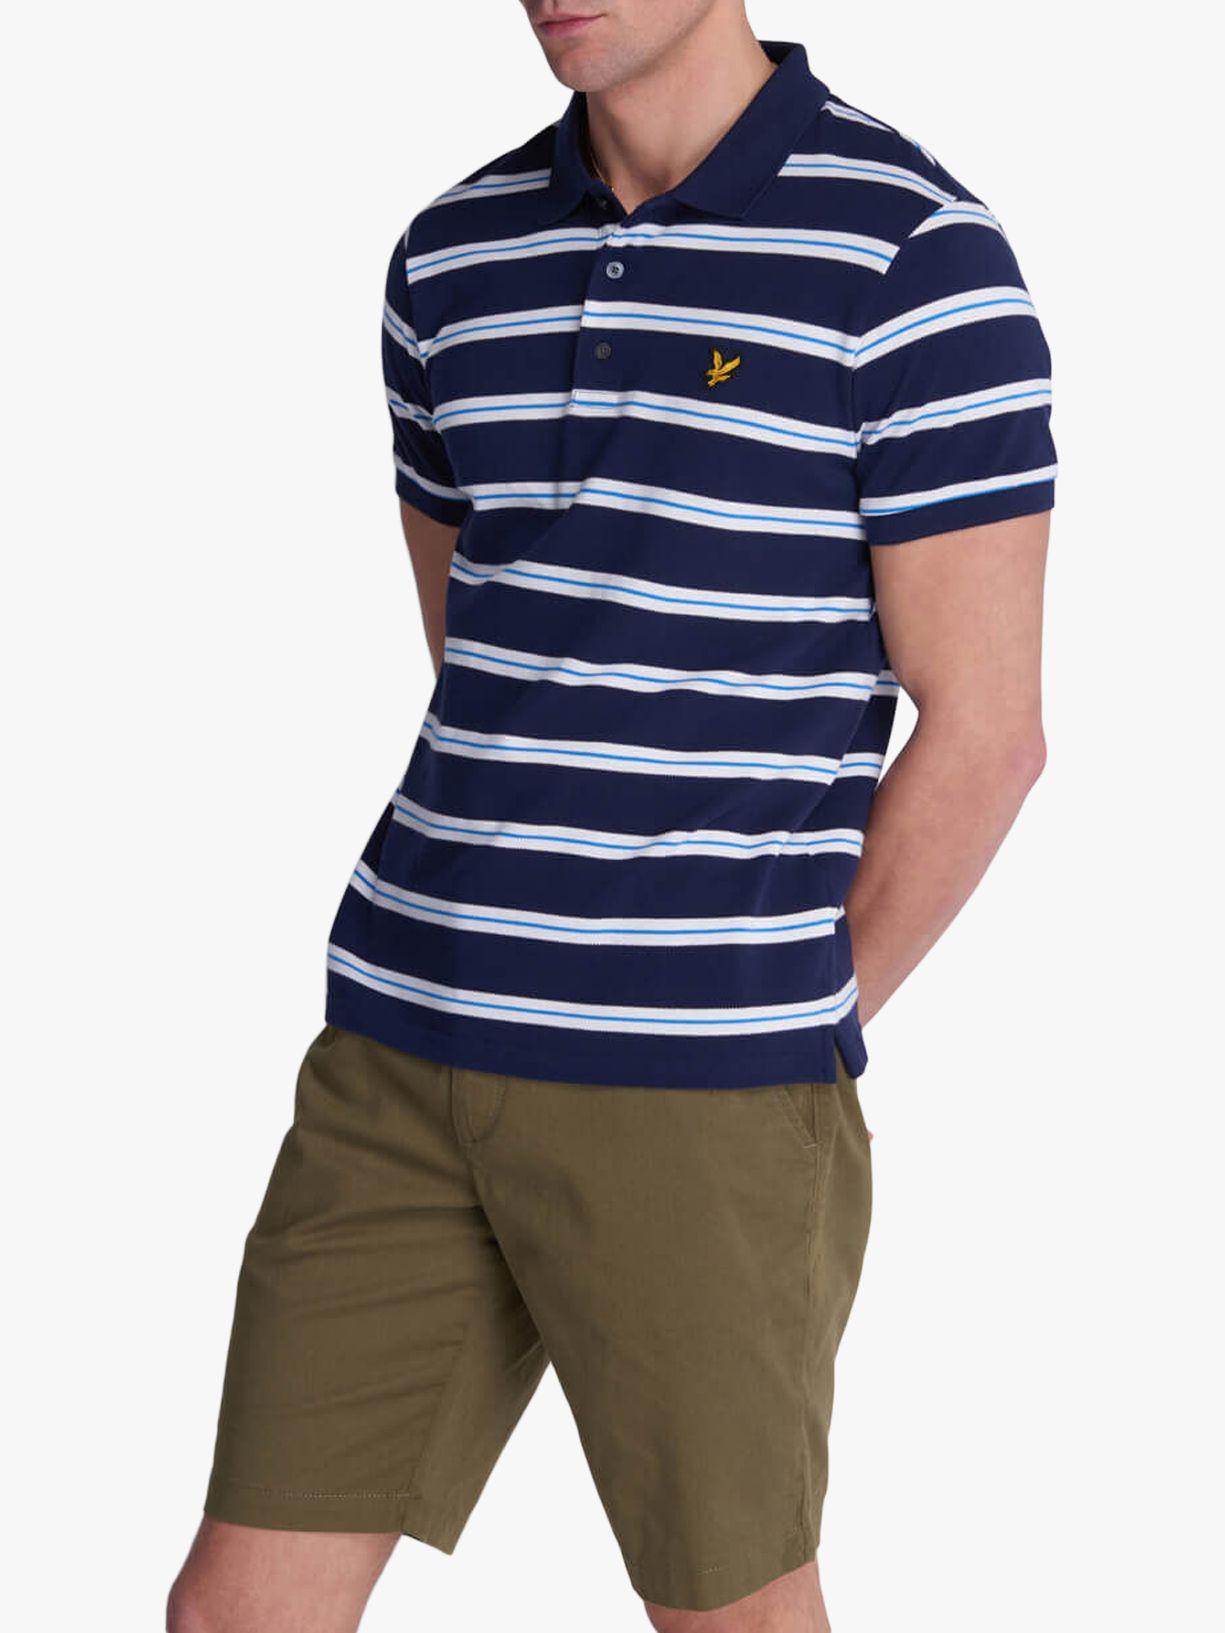 Lyle & Scott Lyle & Scott Wide Double Stripe Polo Shirt, Navy